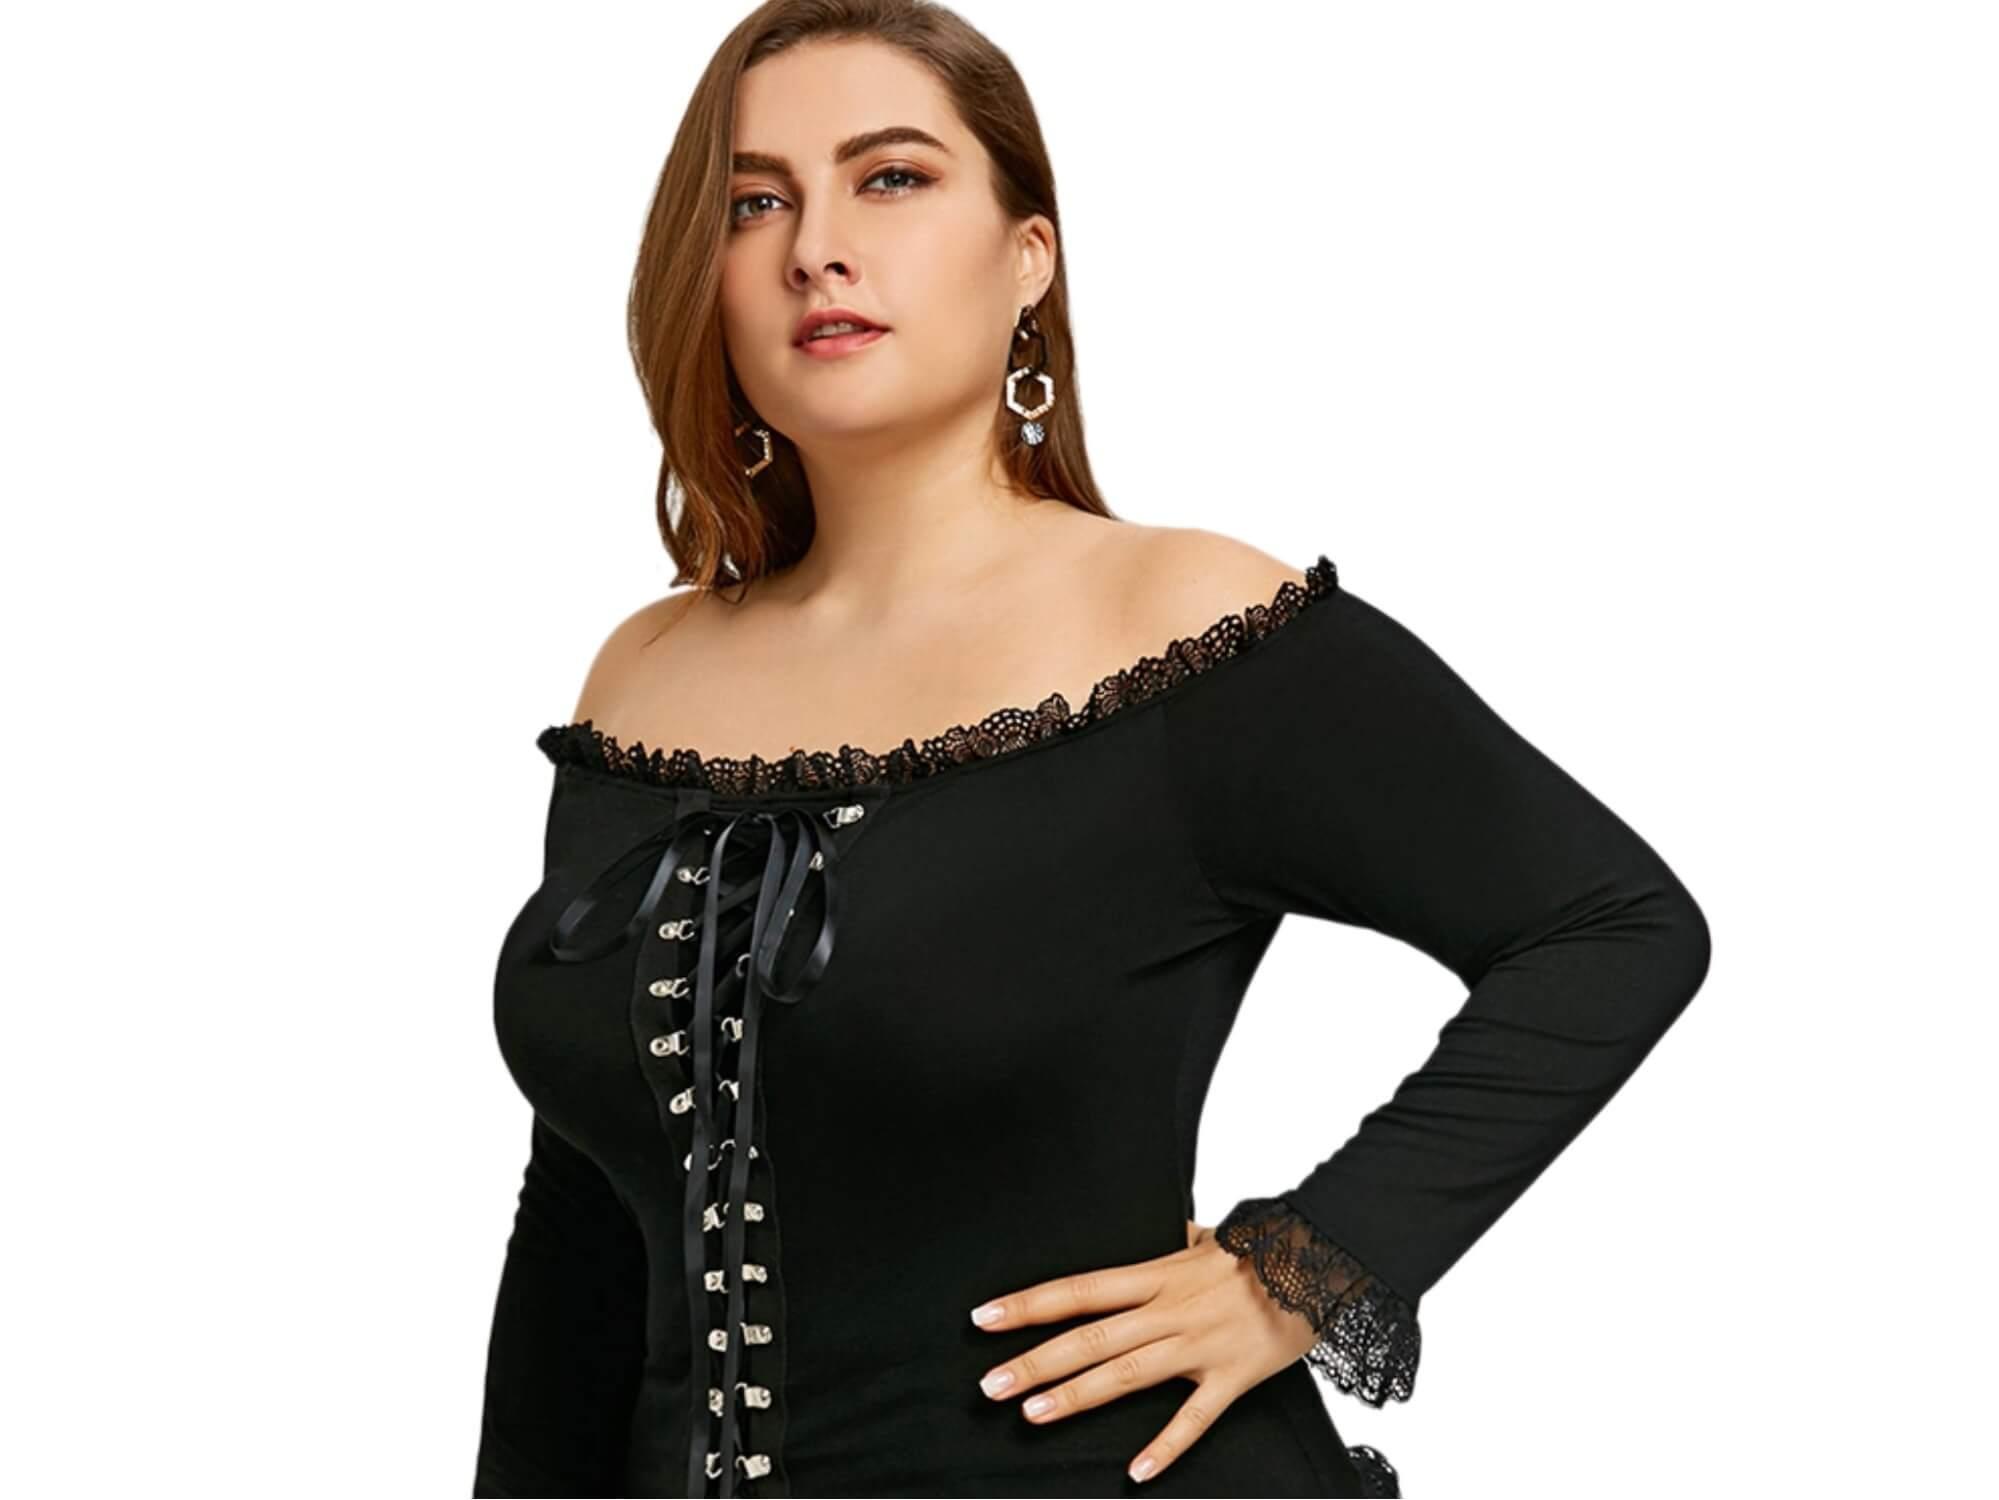 Кофта с открытыми плечами - мода 2018 года